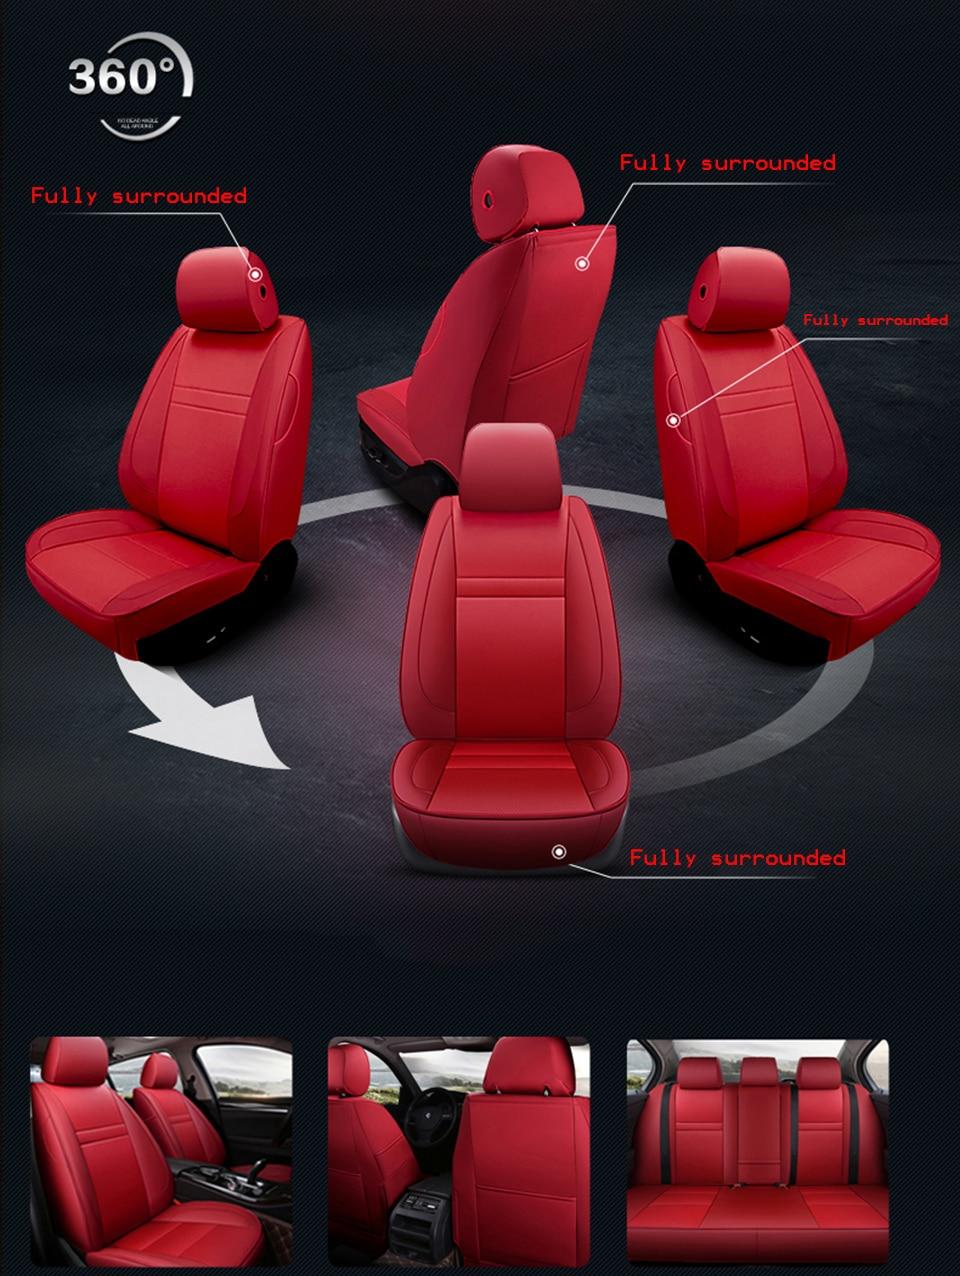 4 in 1 car seat 1